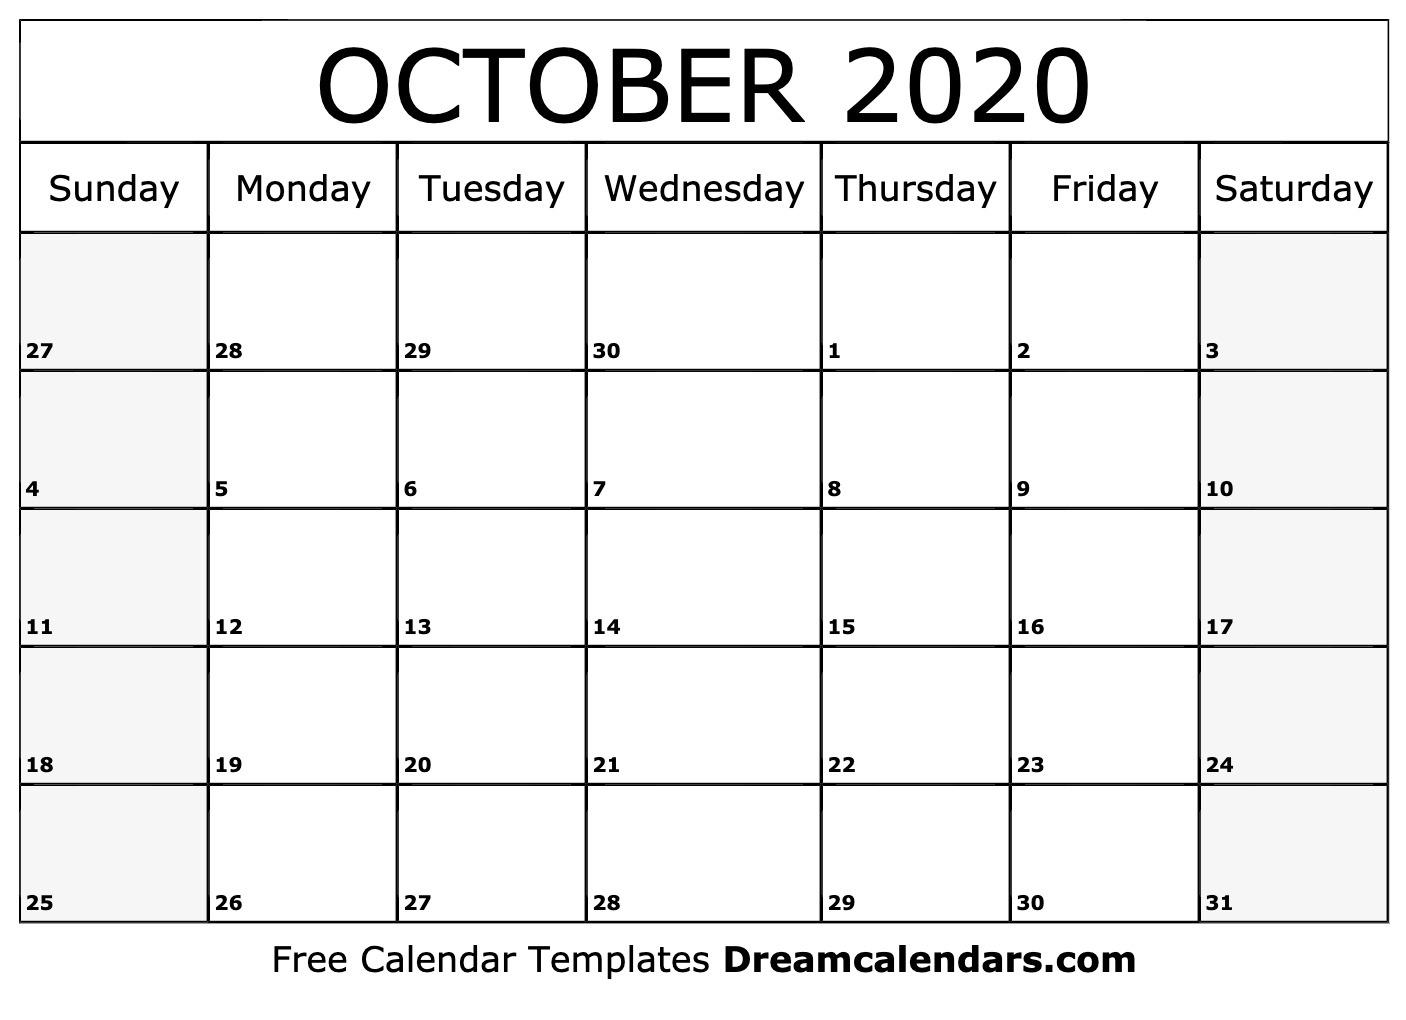 Printable October 2020 Calendar_Blank Calendar For October 2020